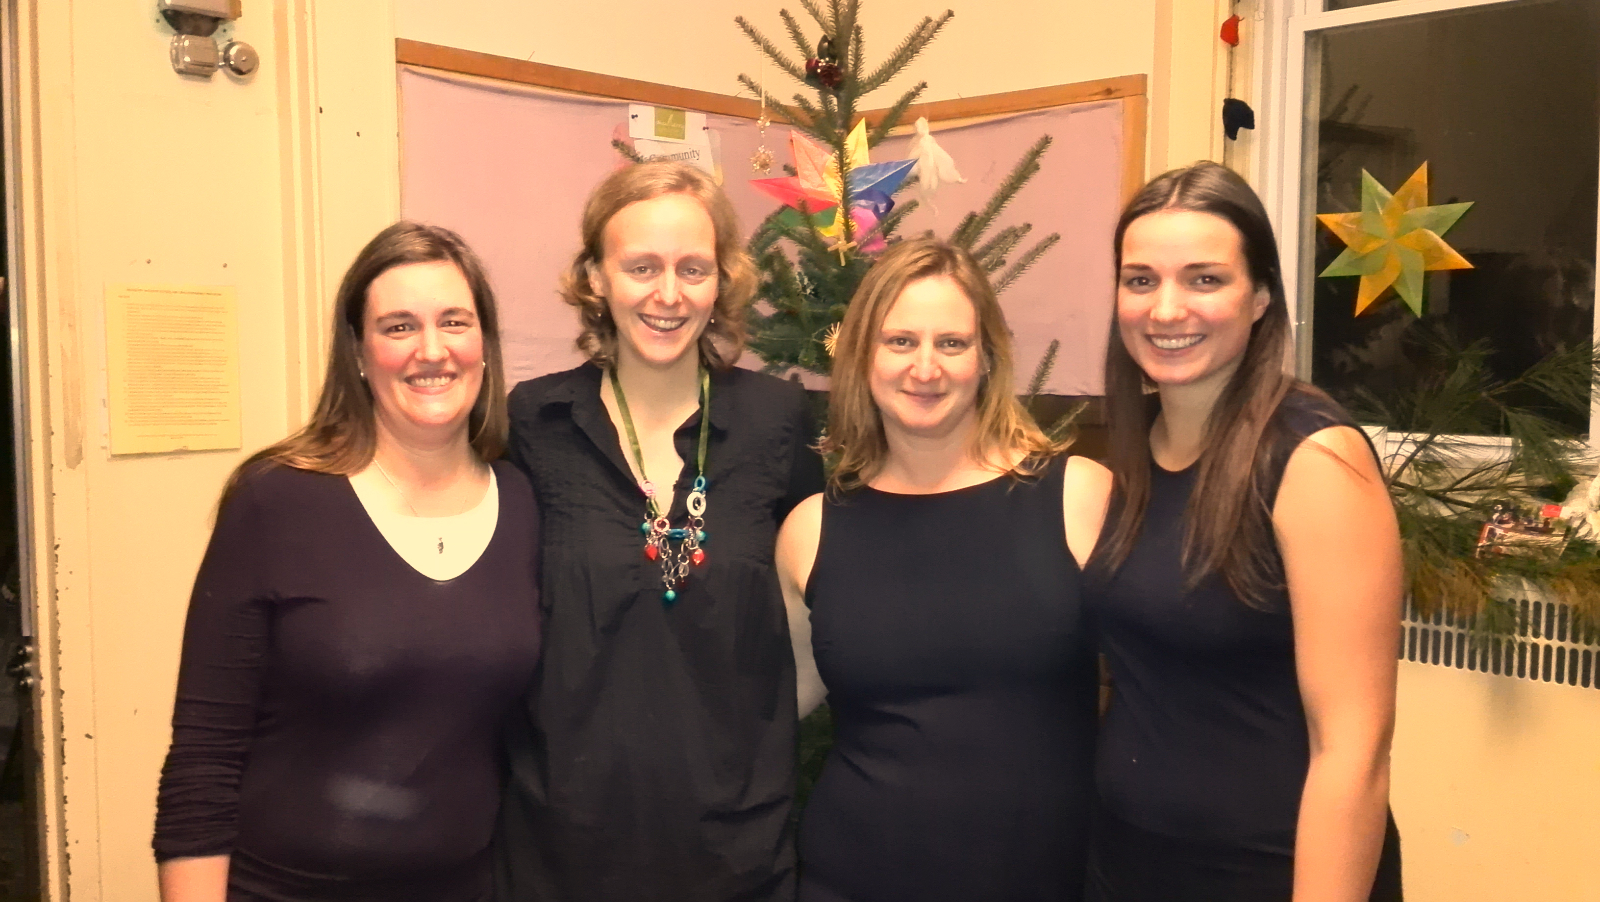 Nanette Morin, Chelsea Stelmach, Patricia Weidmark and Megan Robert